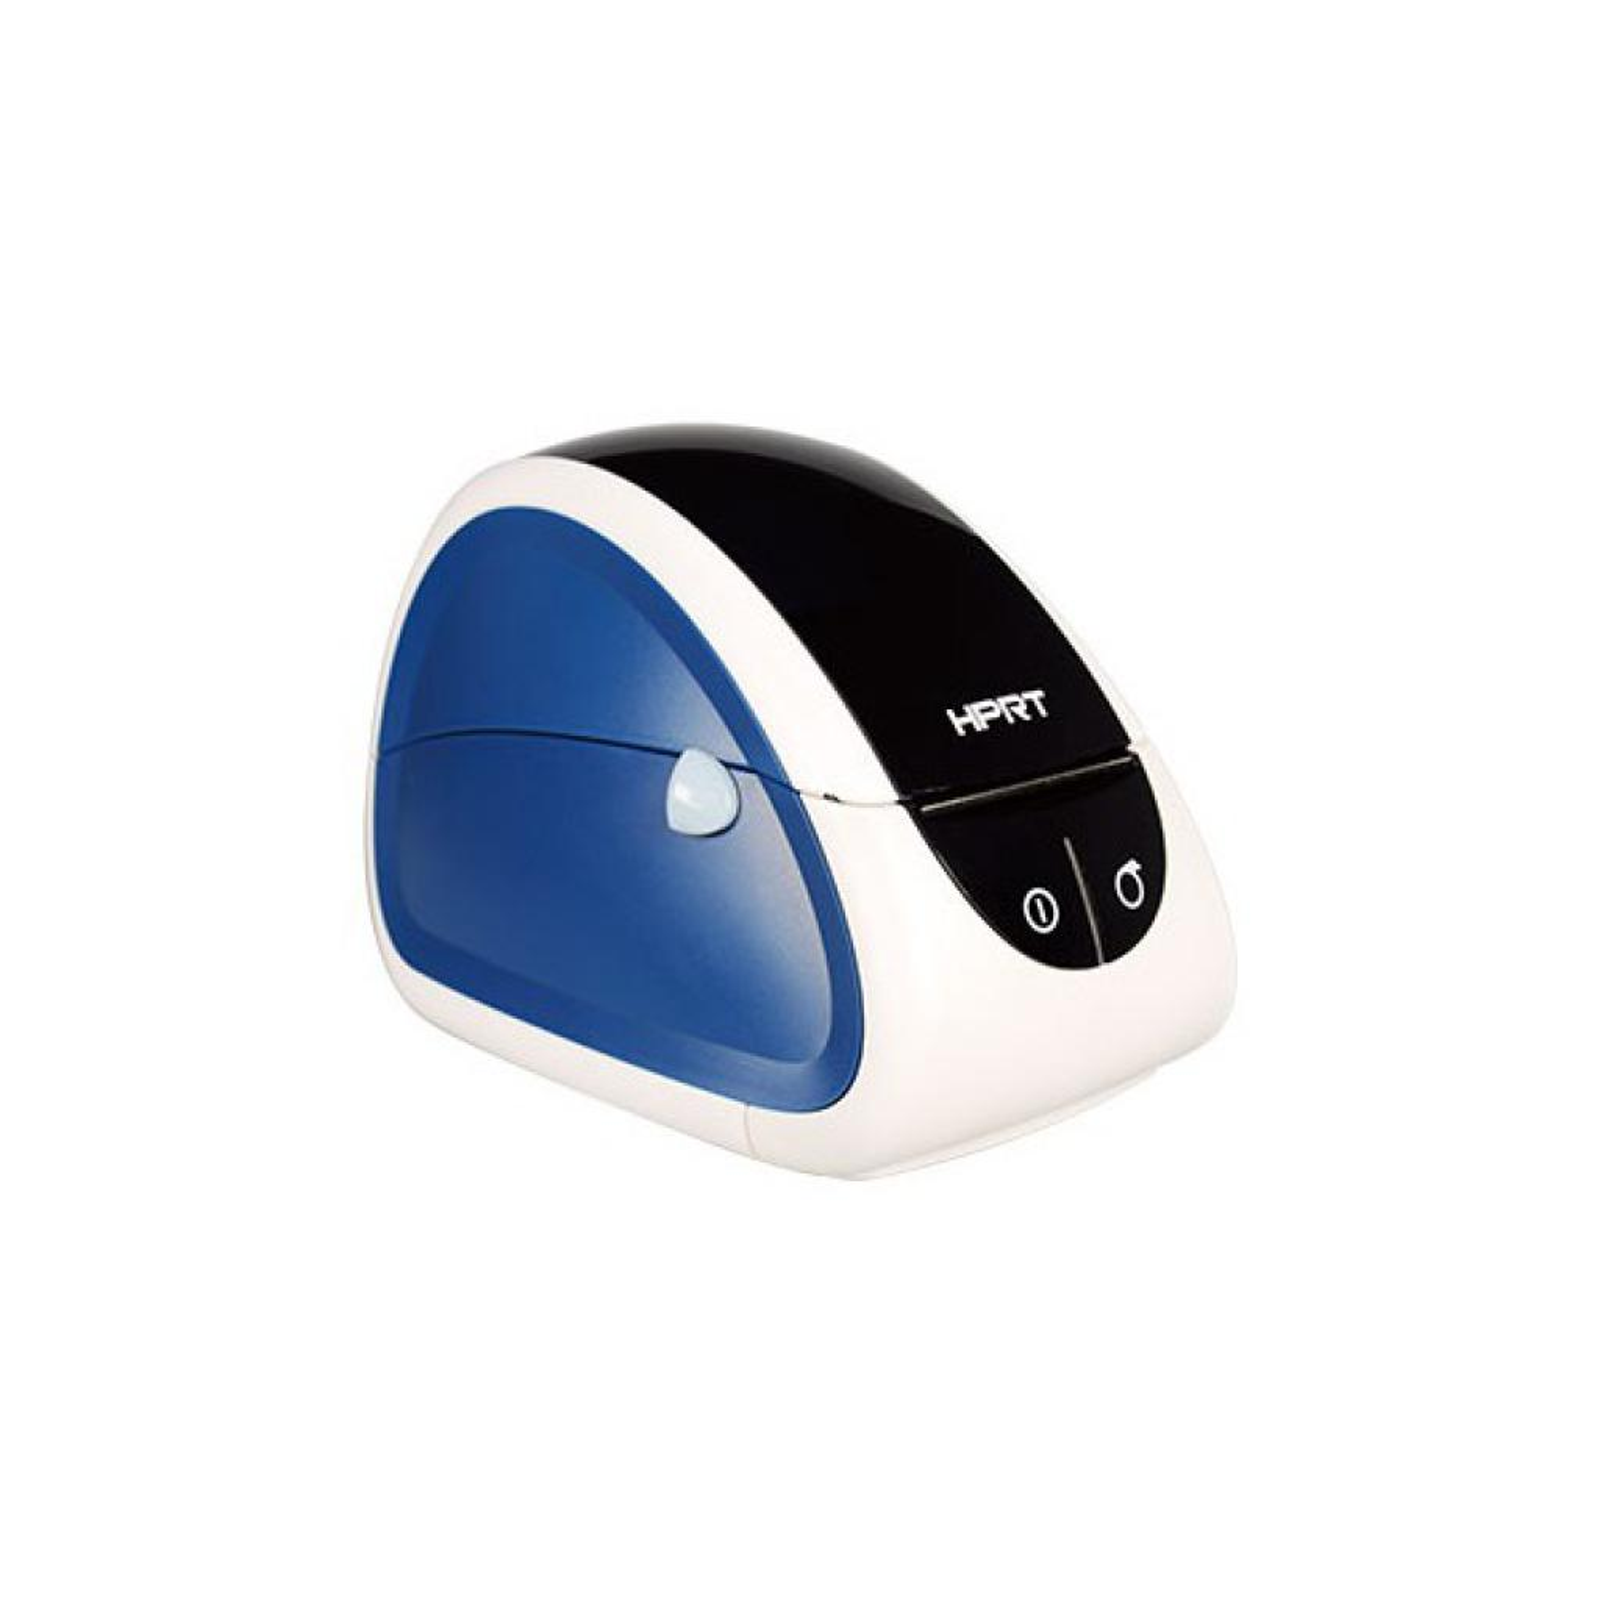 Принтер этикеток HPRT LPQ58 White_Blue (9545)